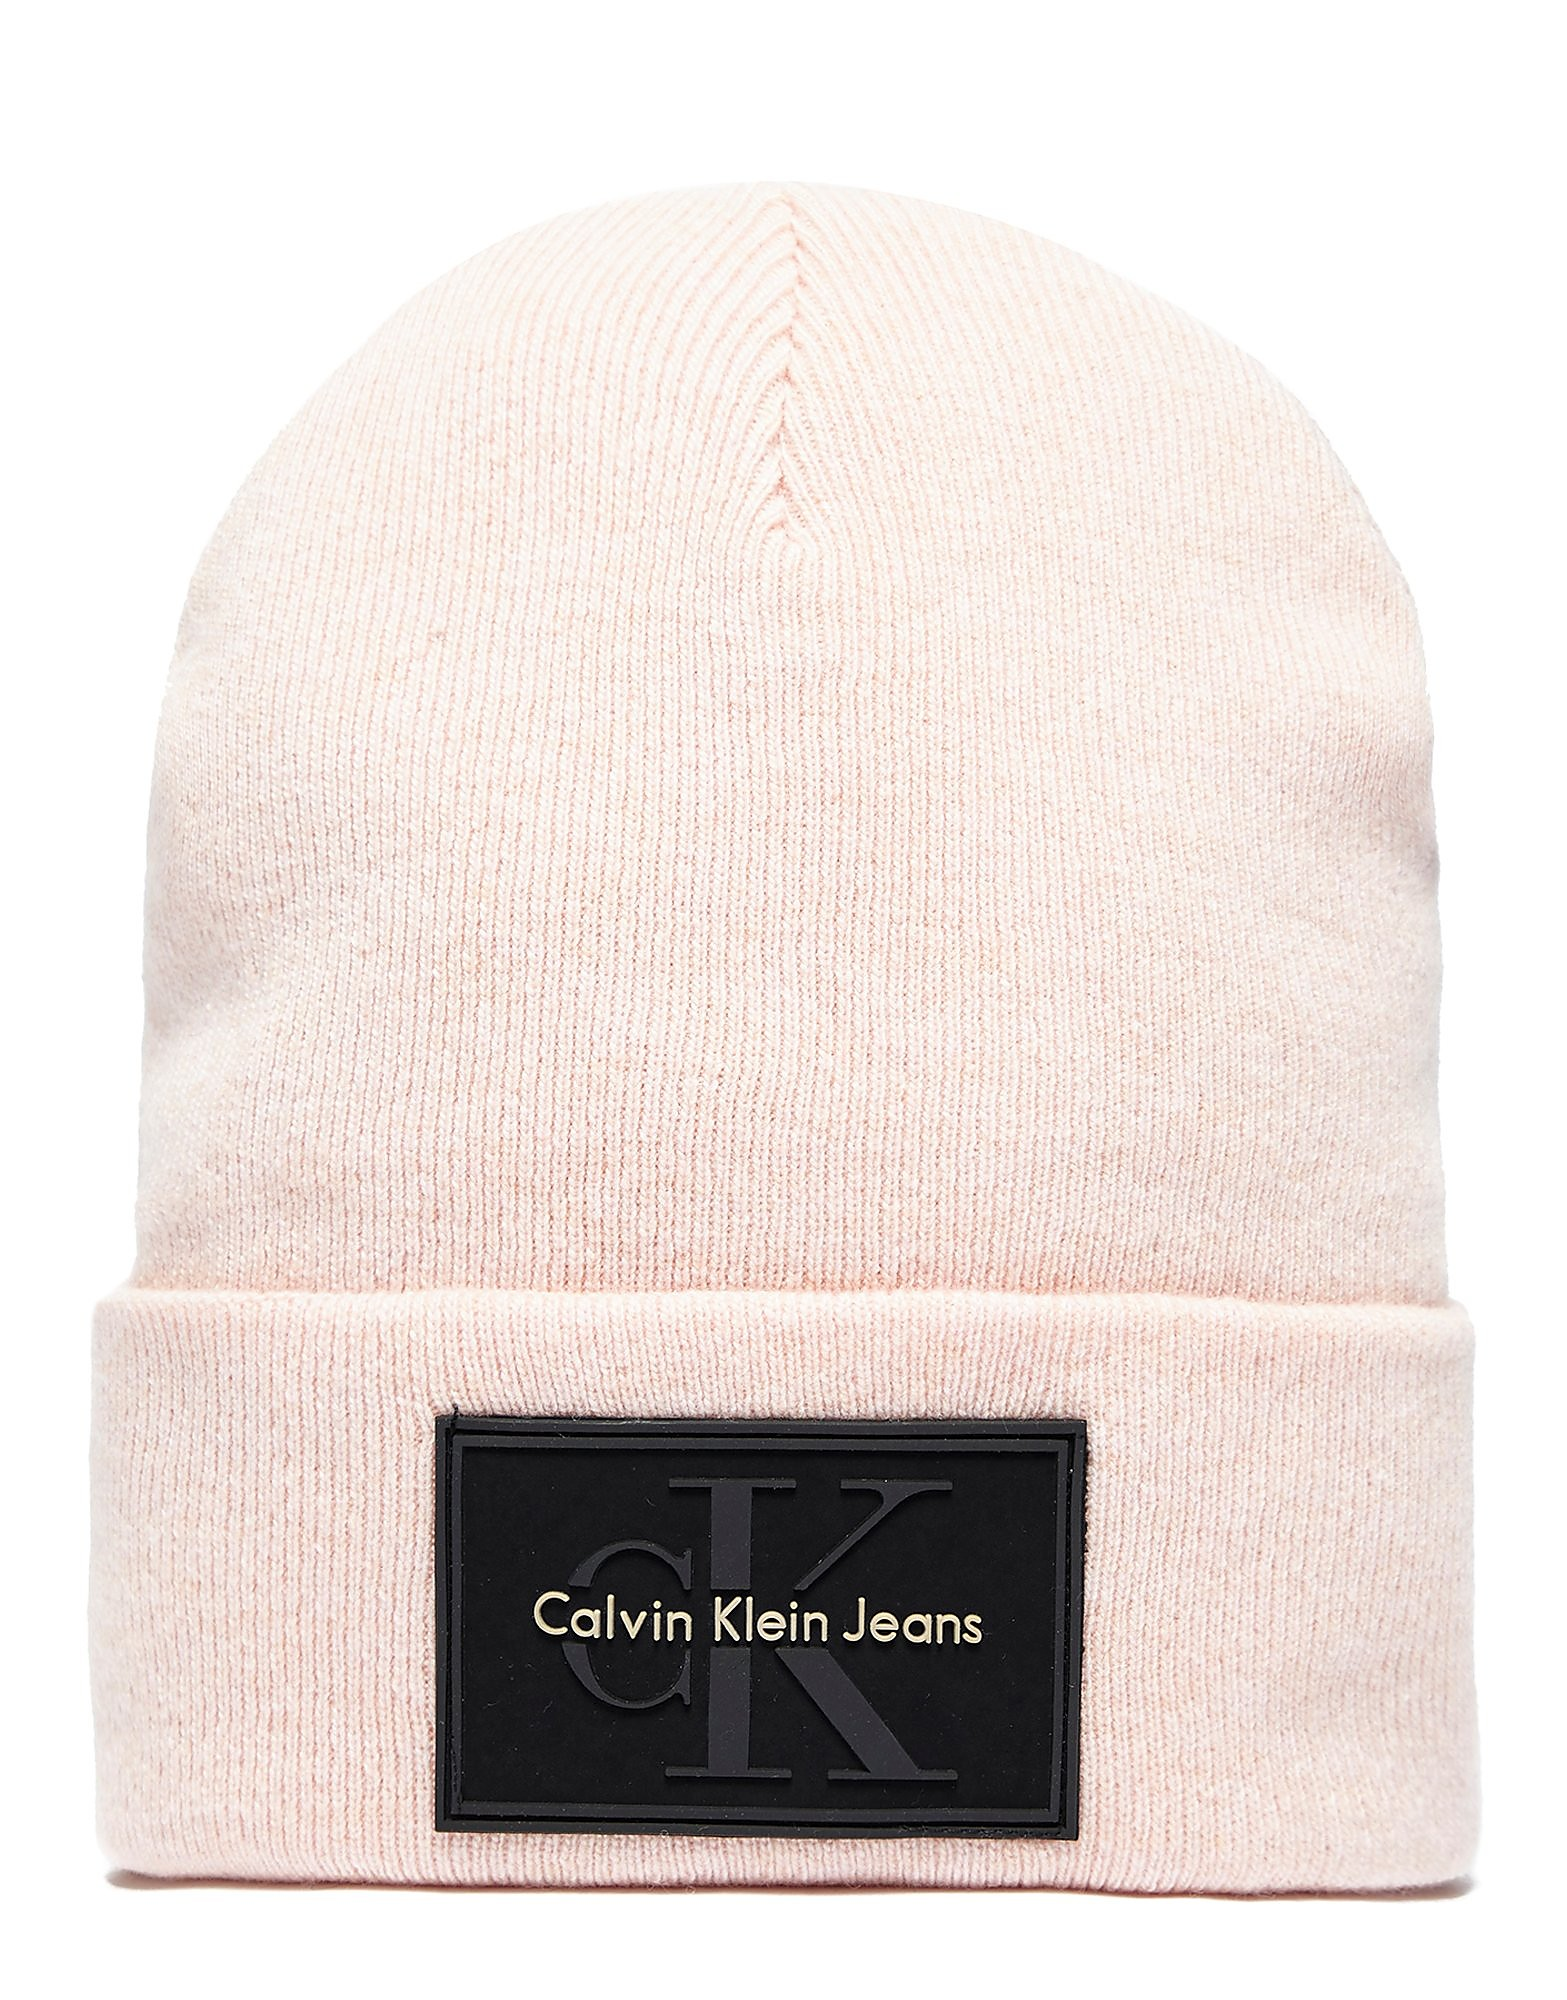 Calvin Klein Re-Issue Beanie